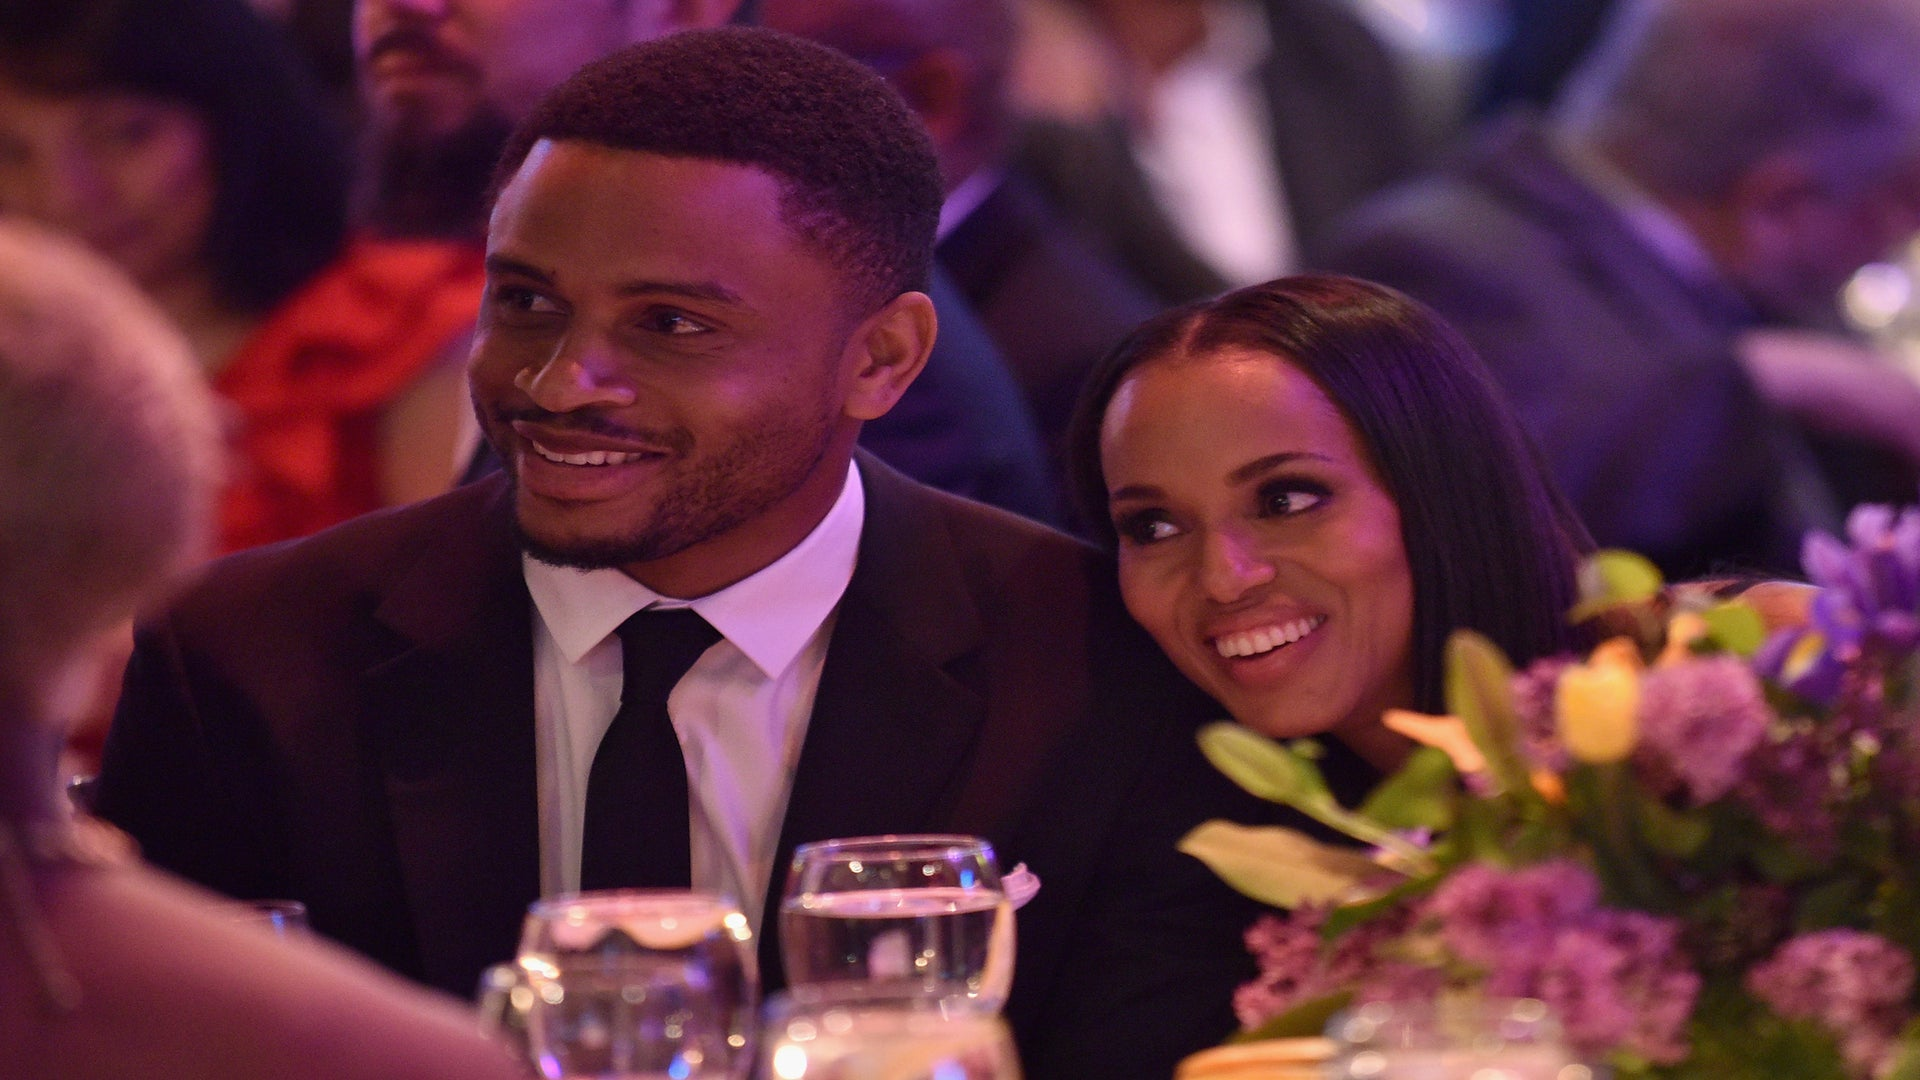 Kerry Washington And Husband Nnamdi Asomugha Were All Smiles At Bronx's Children Museum Gala